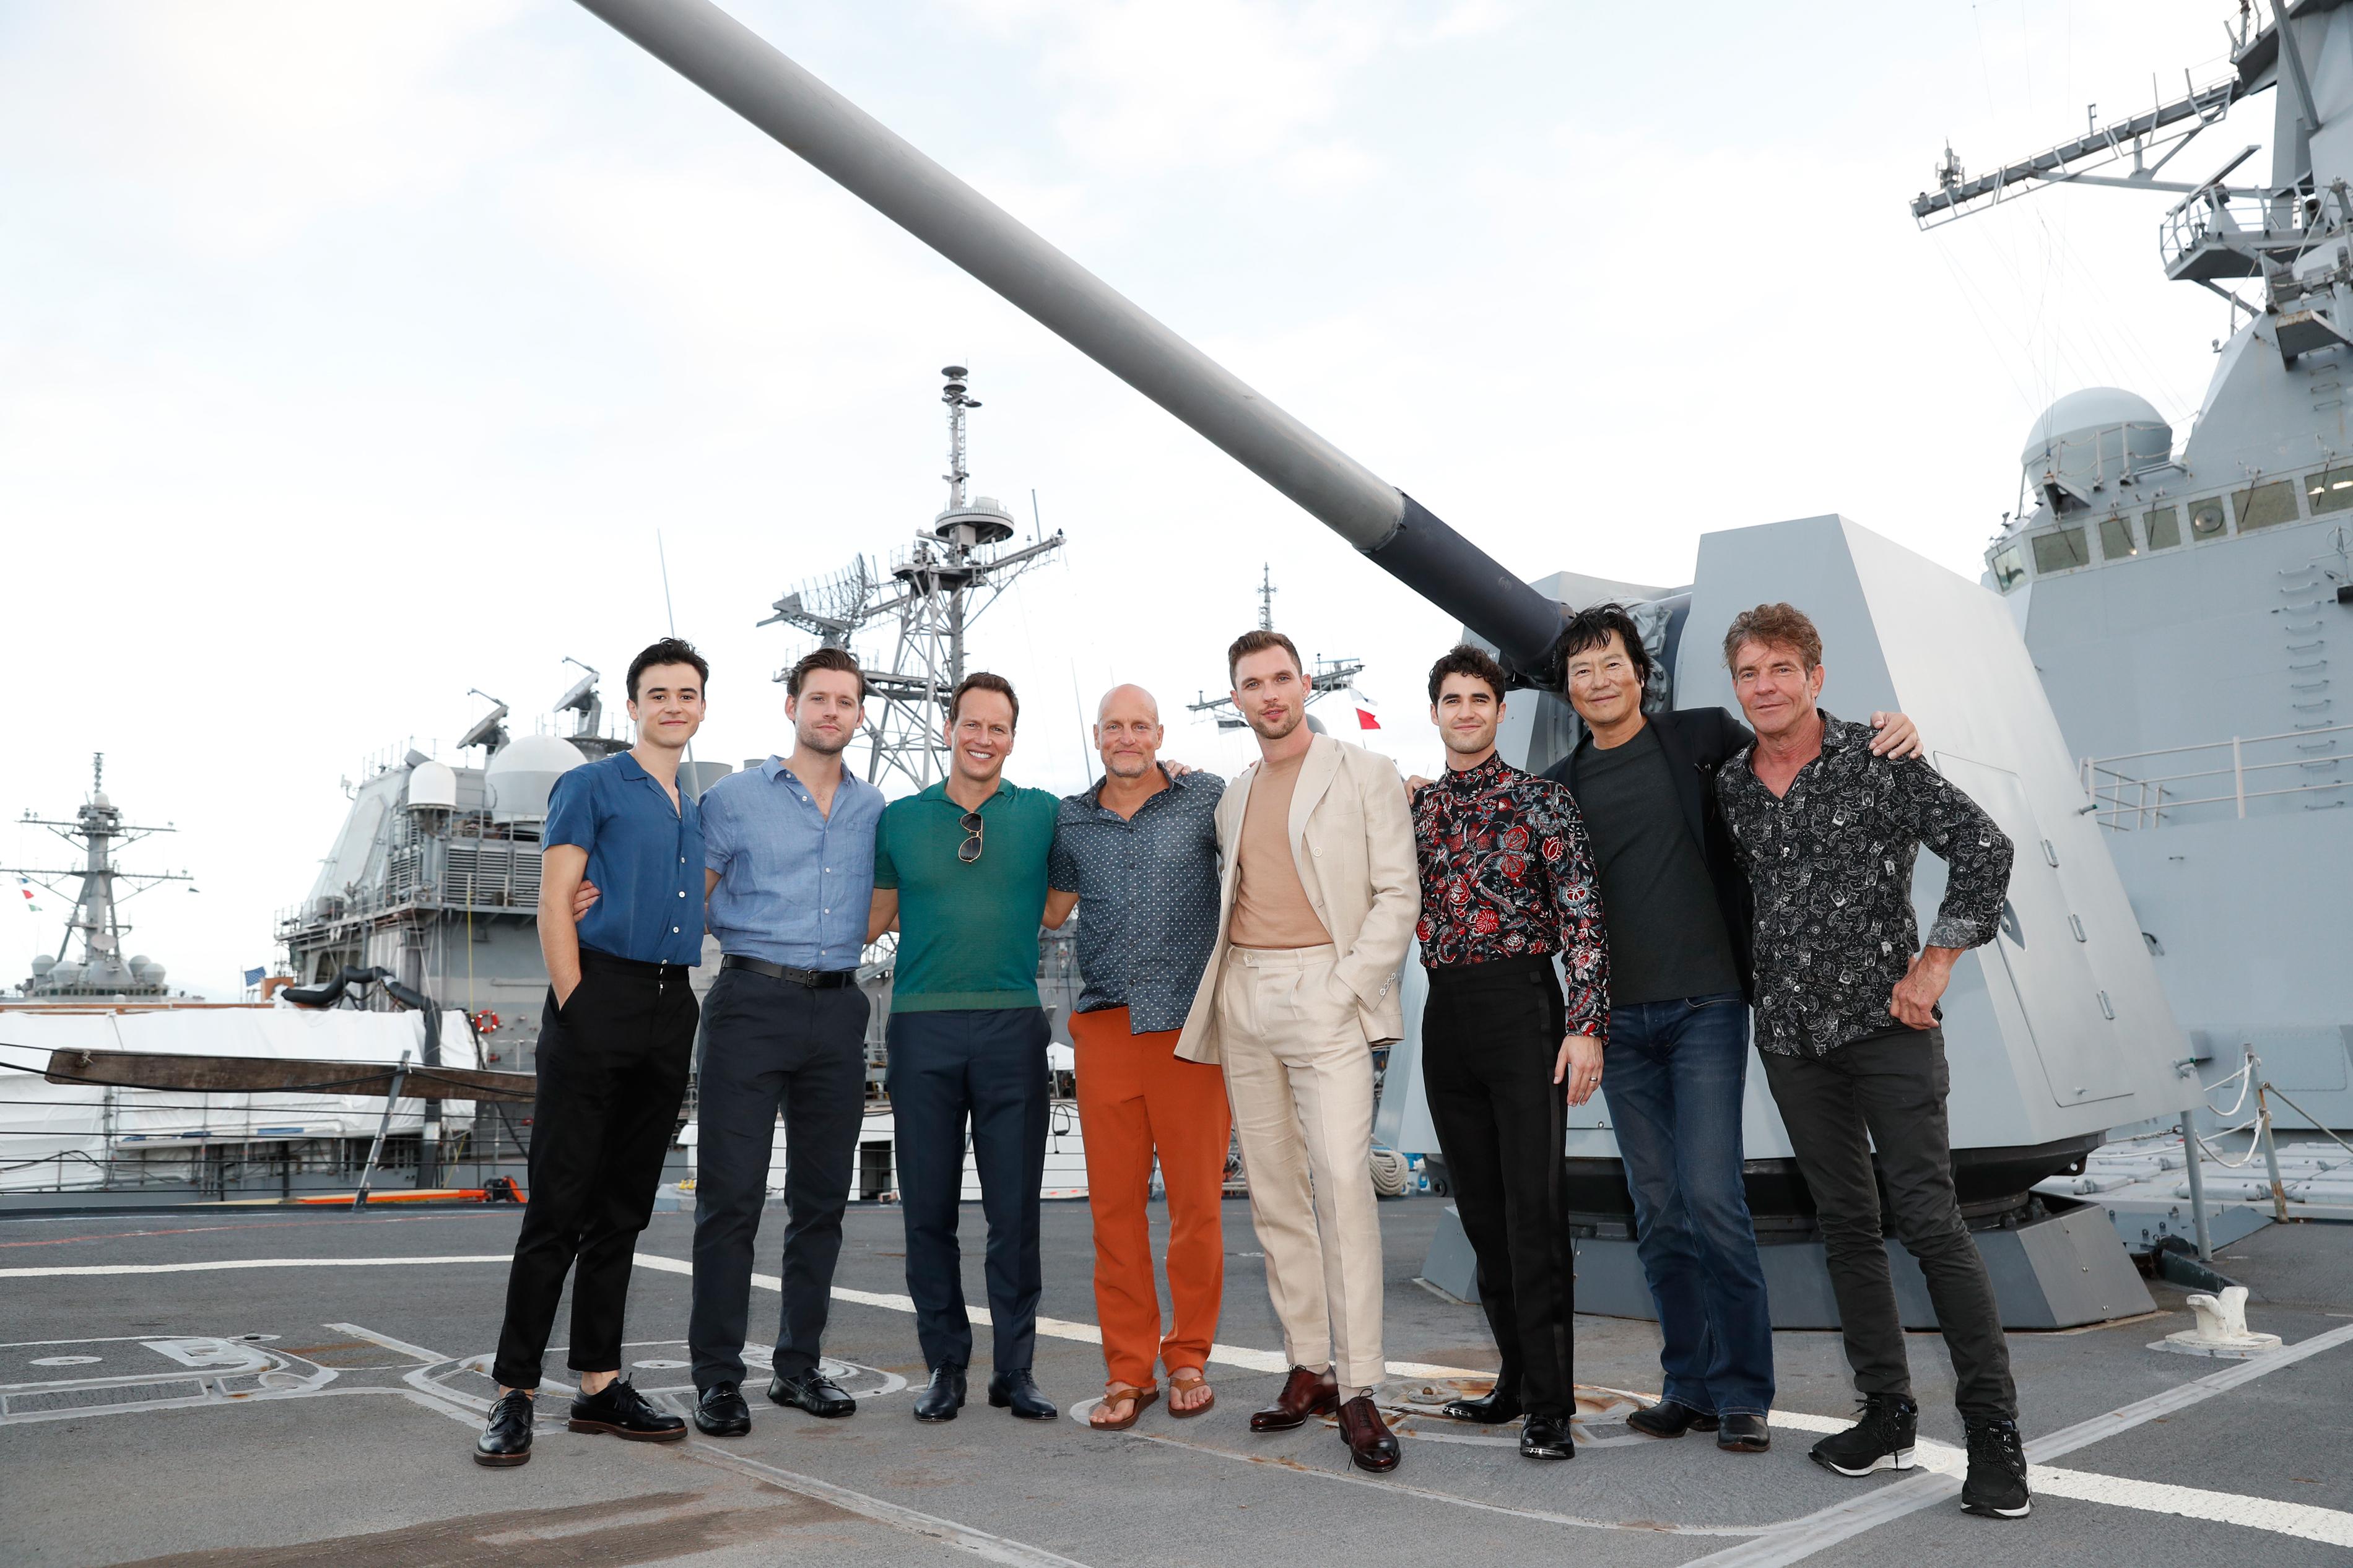 Woody Harrelson, Dennis Quaid, Etsushi Toyokawa, Patrick Wilson, Darren Criss, Luke Kleintank, Ed Skrein, and Keean Johnson at an event for Midway (2019)